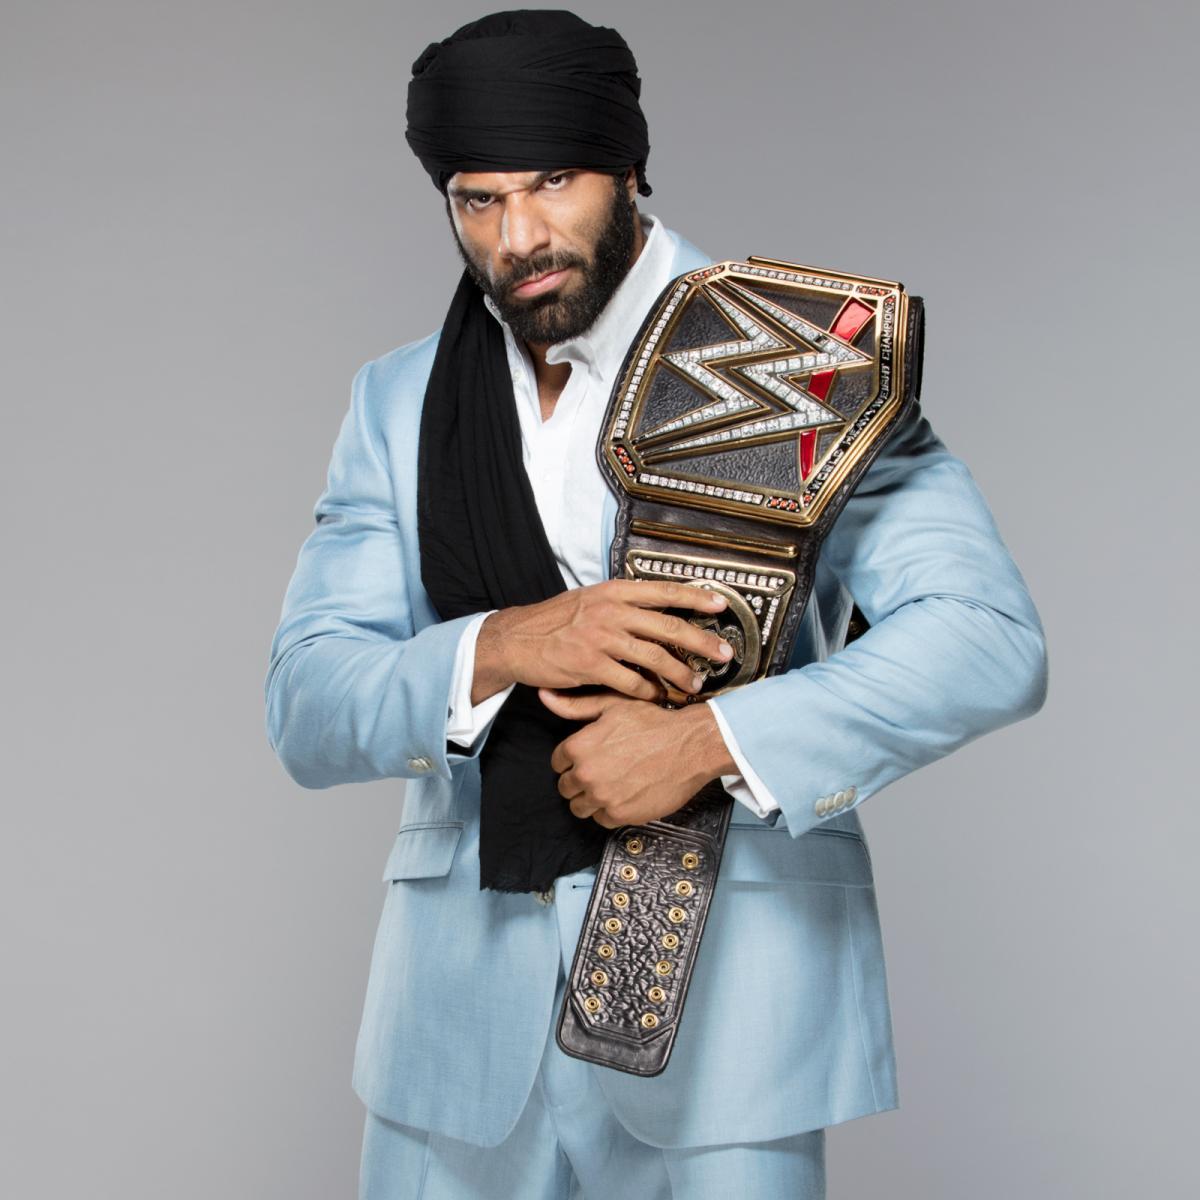 Jinder Mahal WWE Champion 2017